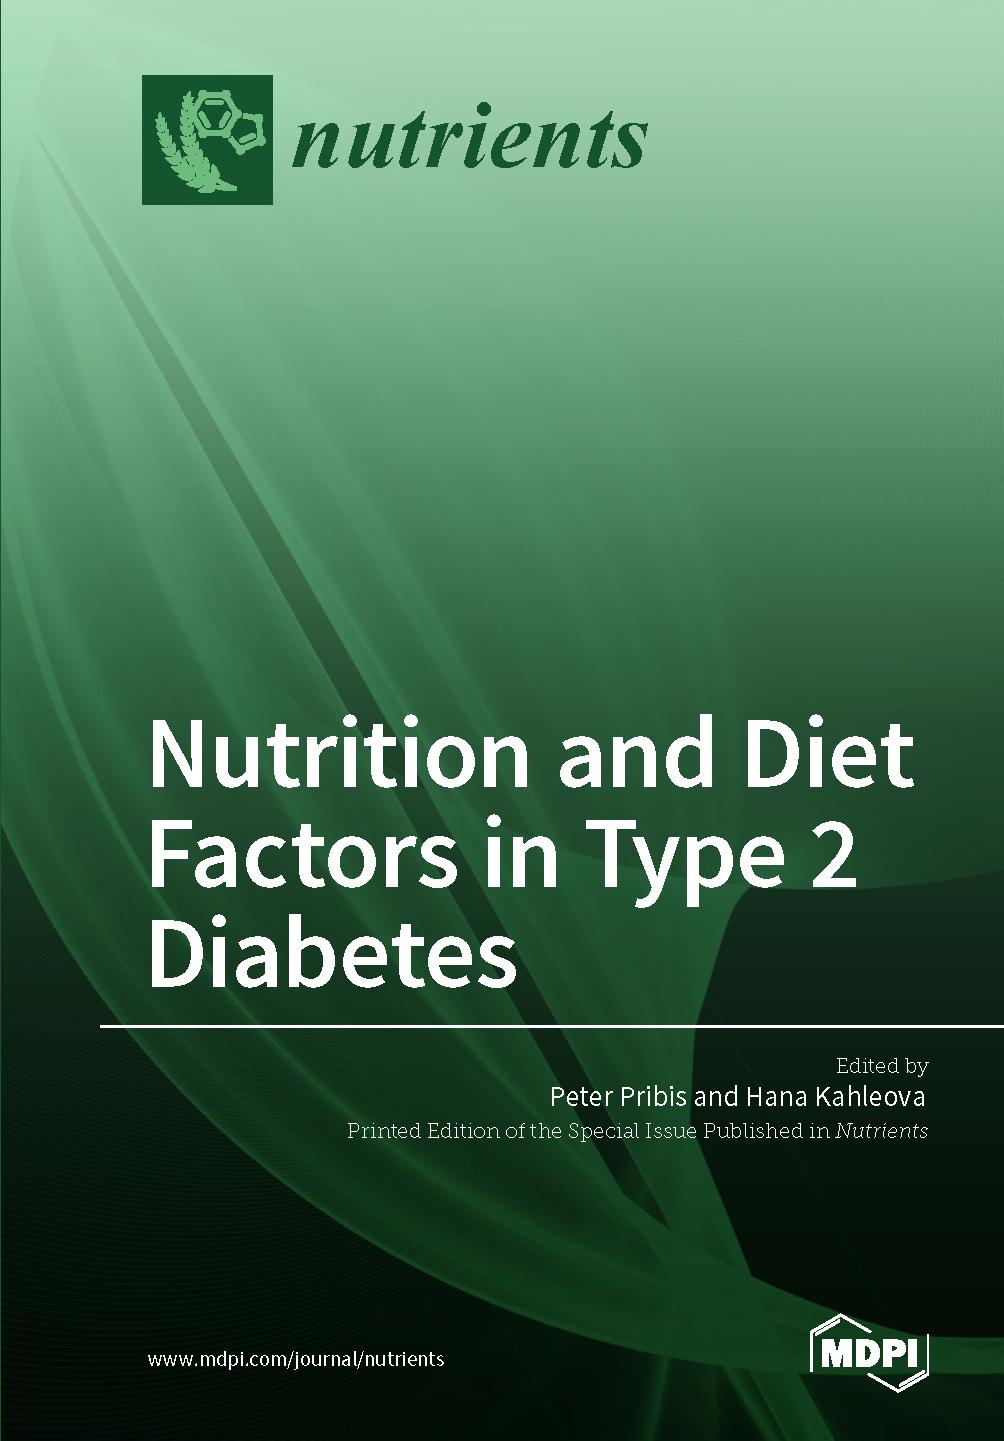 Nutrition and Diet Factors in Type 2 Diabetes